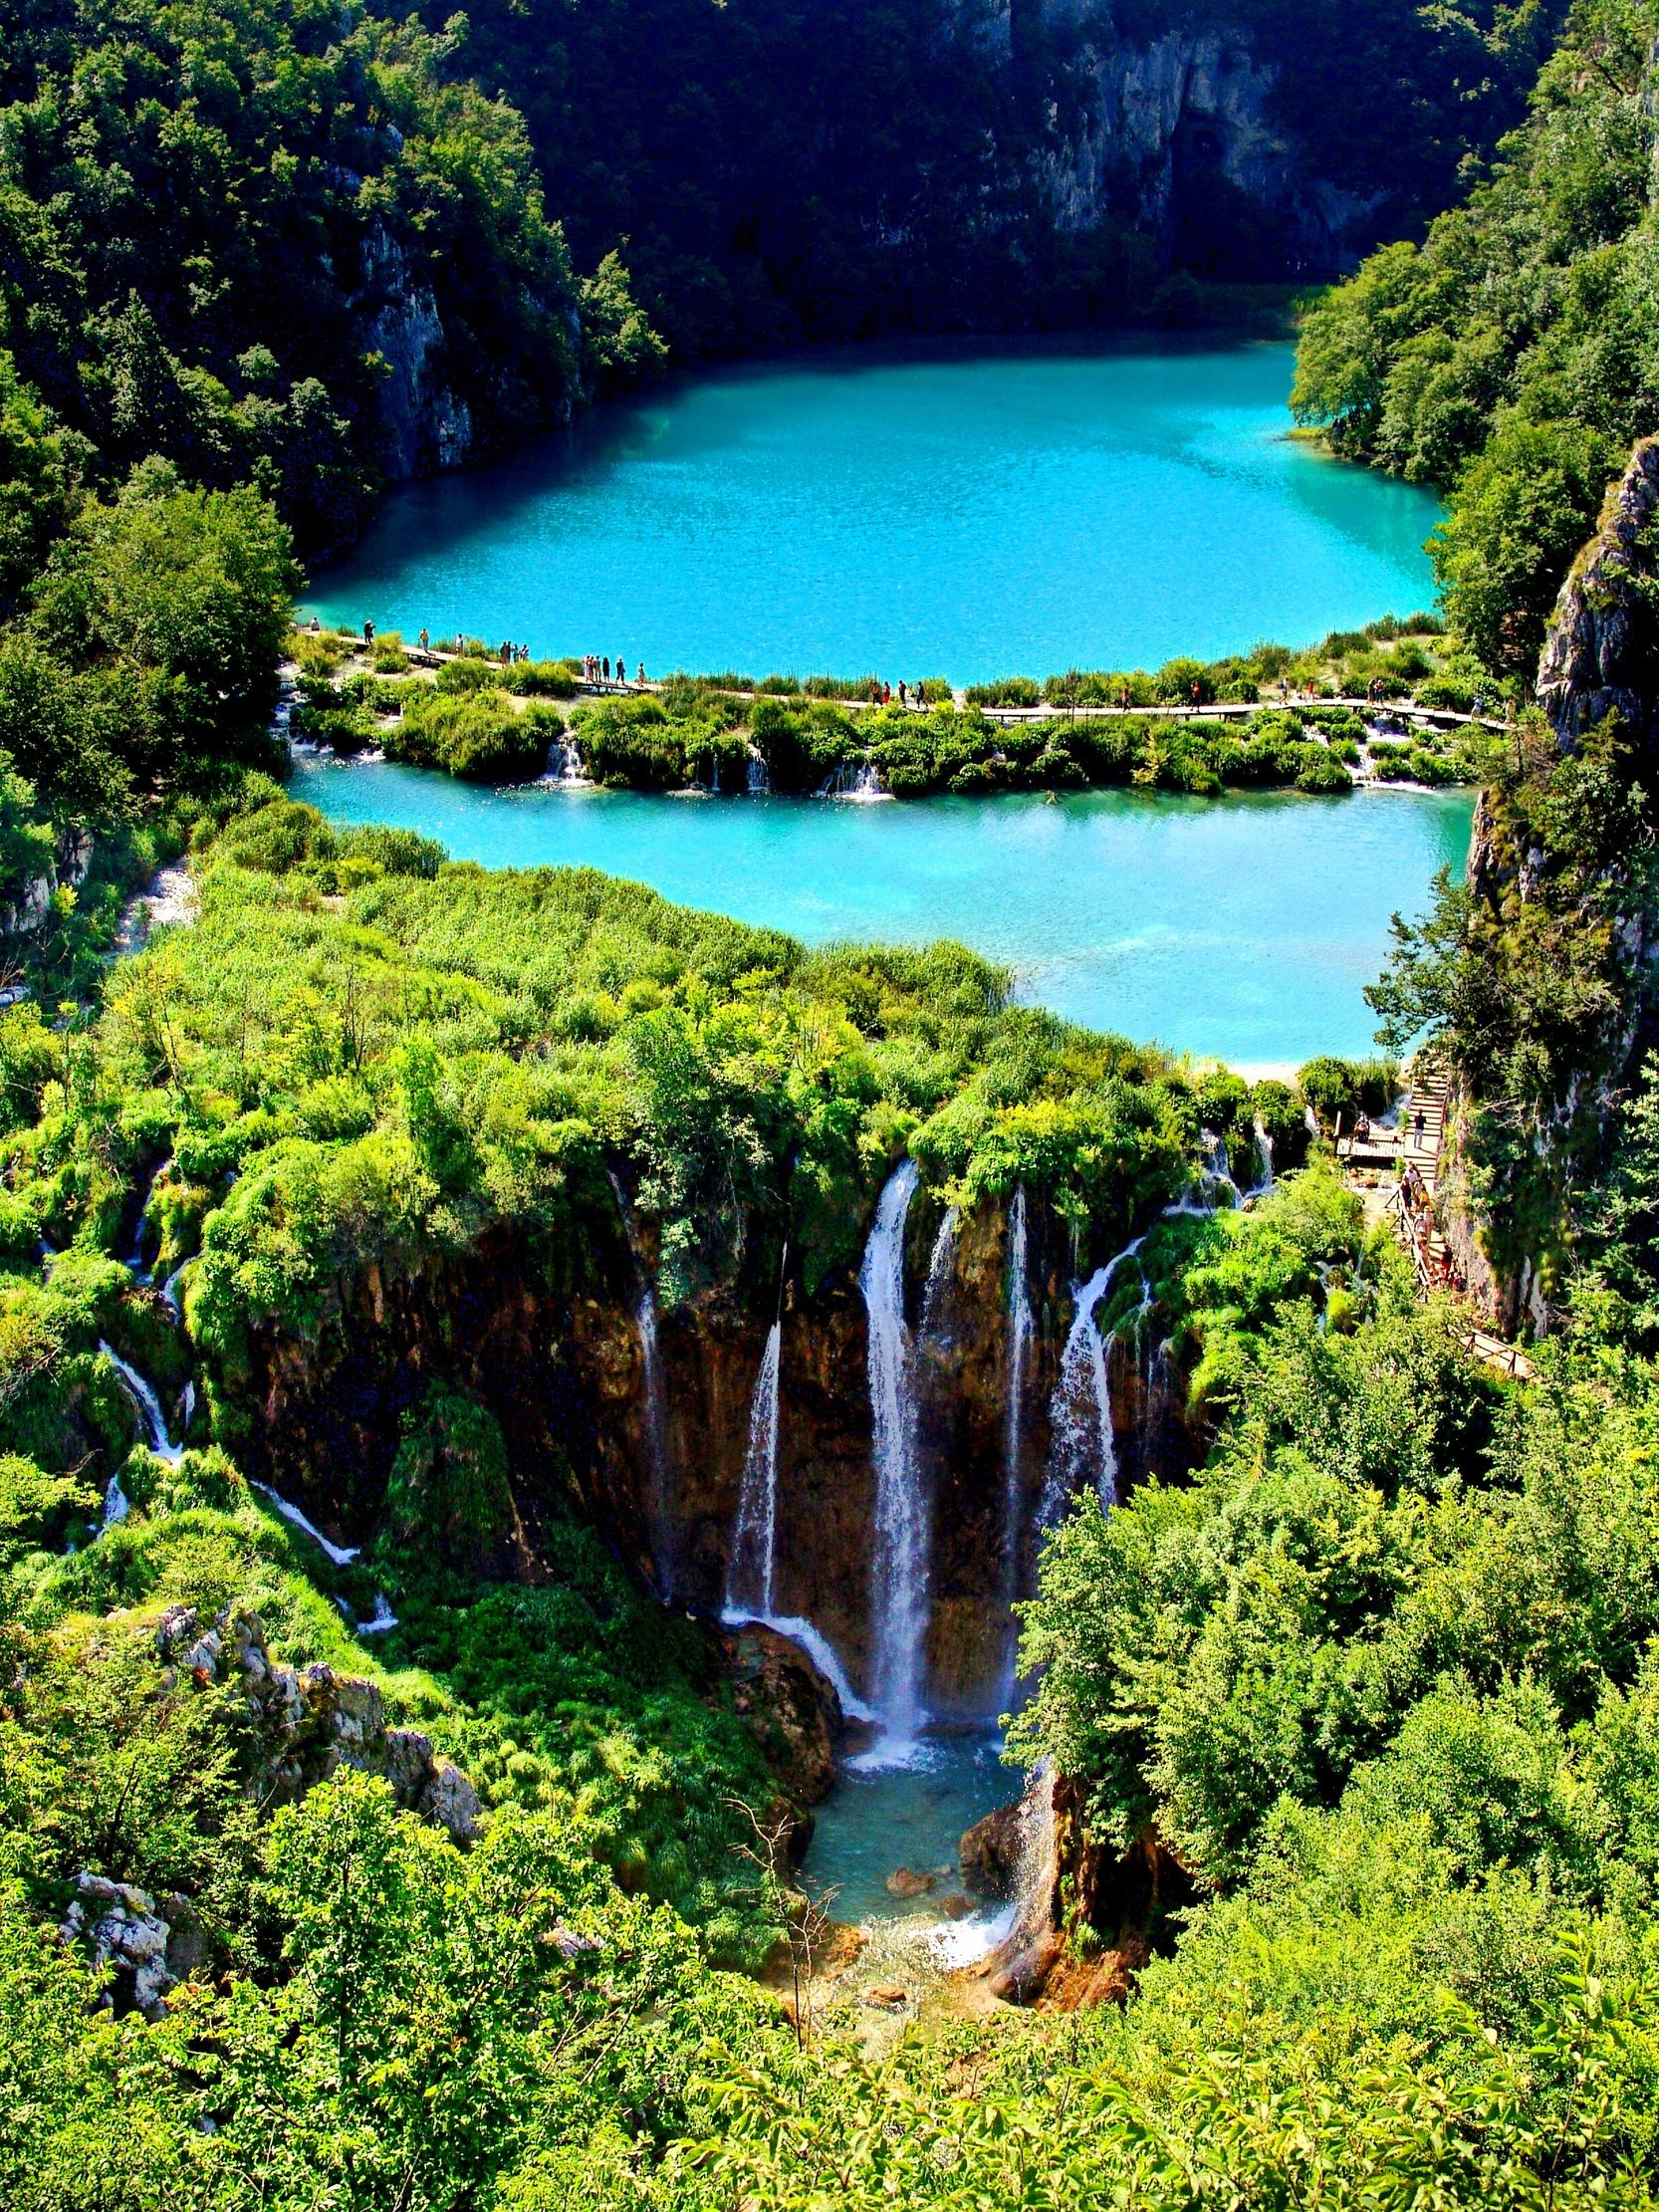 Luxury Croatia Travel Review Dubrovnik Mount Srd Hvar